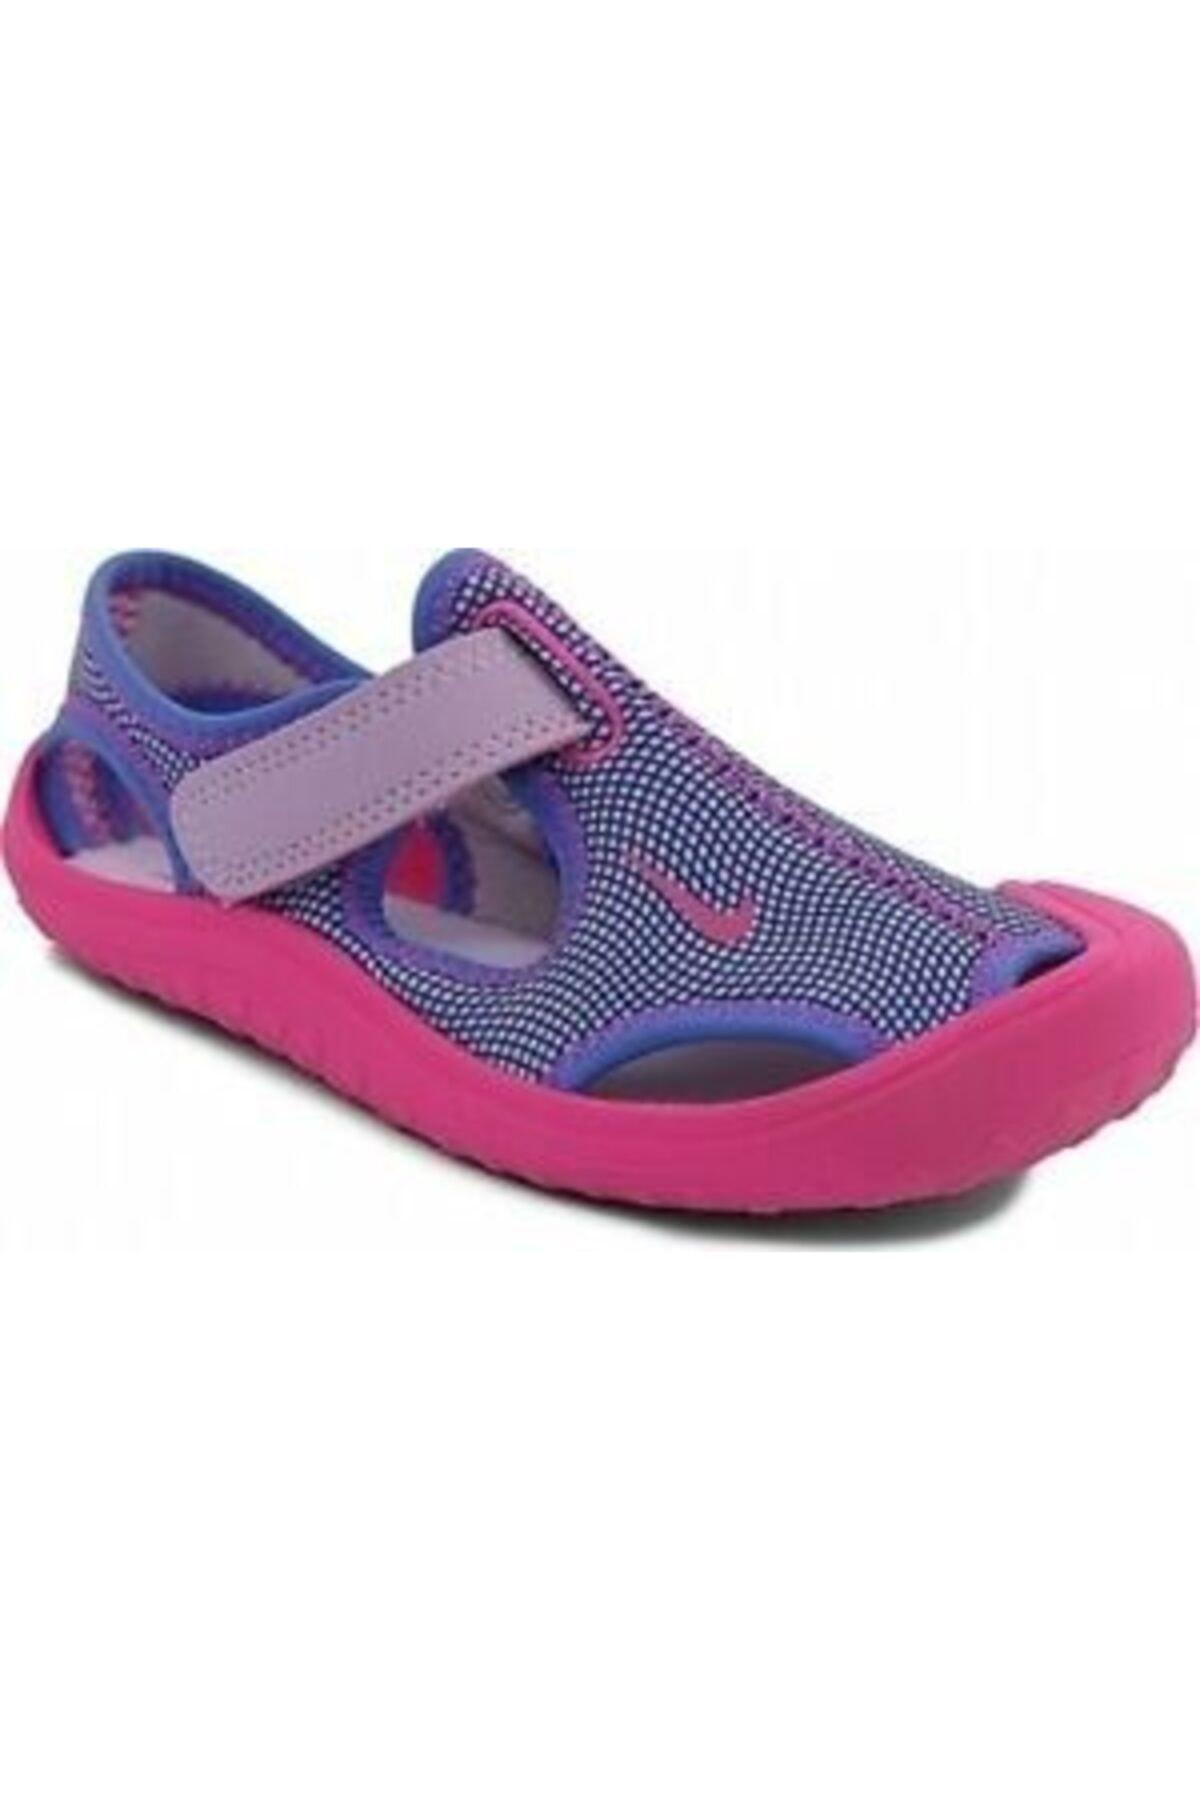 Nike Sunray Protect Çocuk Sandalet 903633-500 2